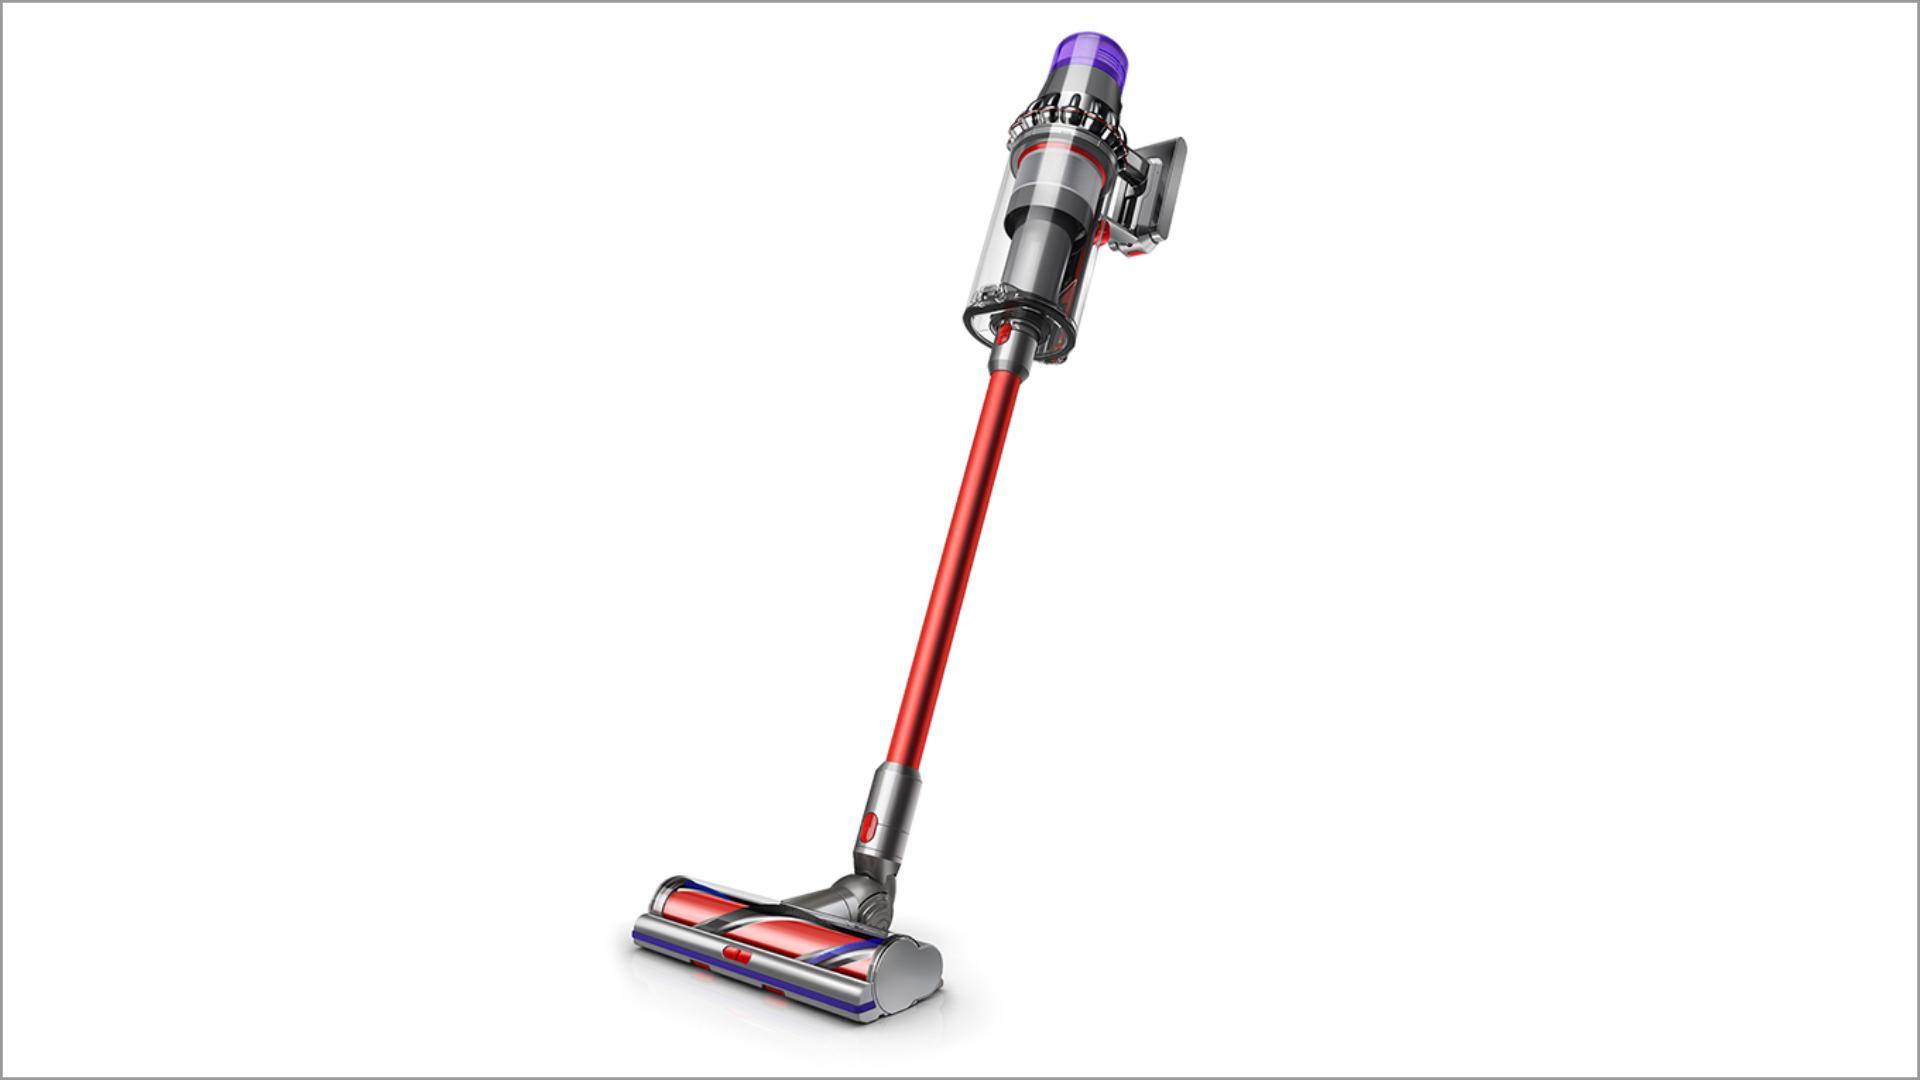 Dyson V11 Outsize vacuum cleaner